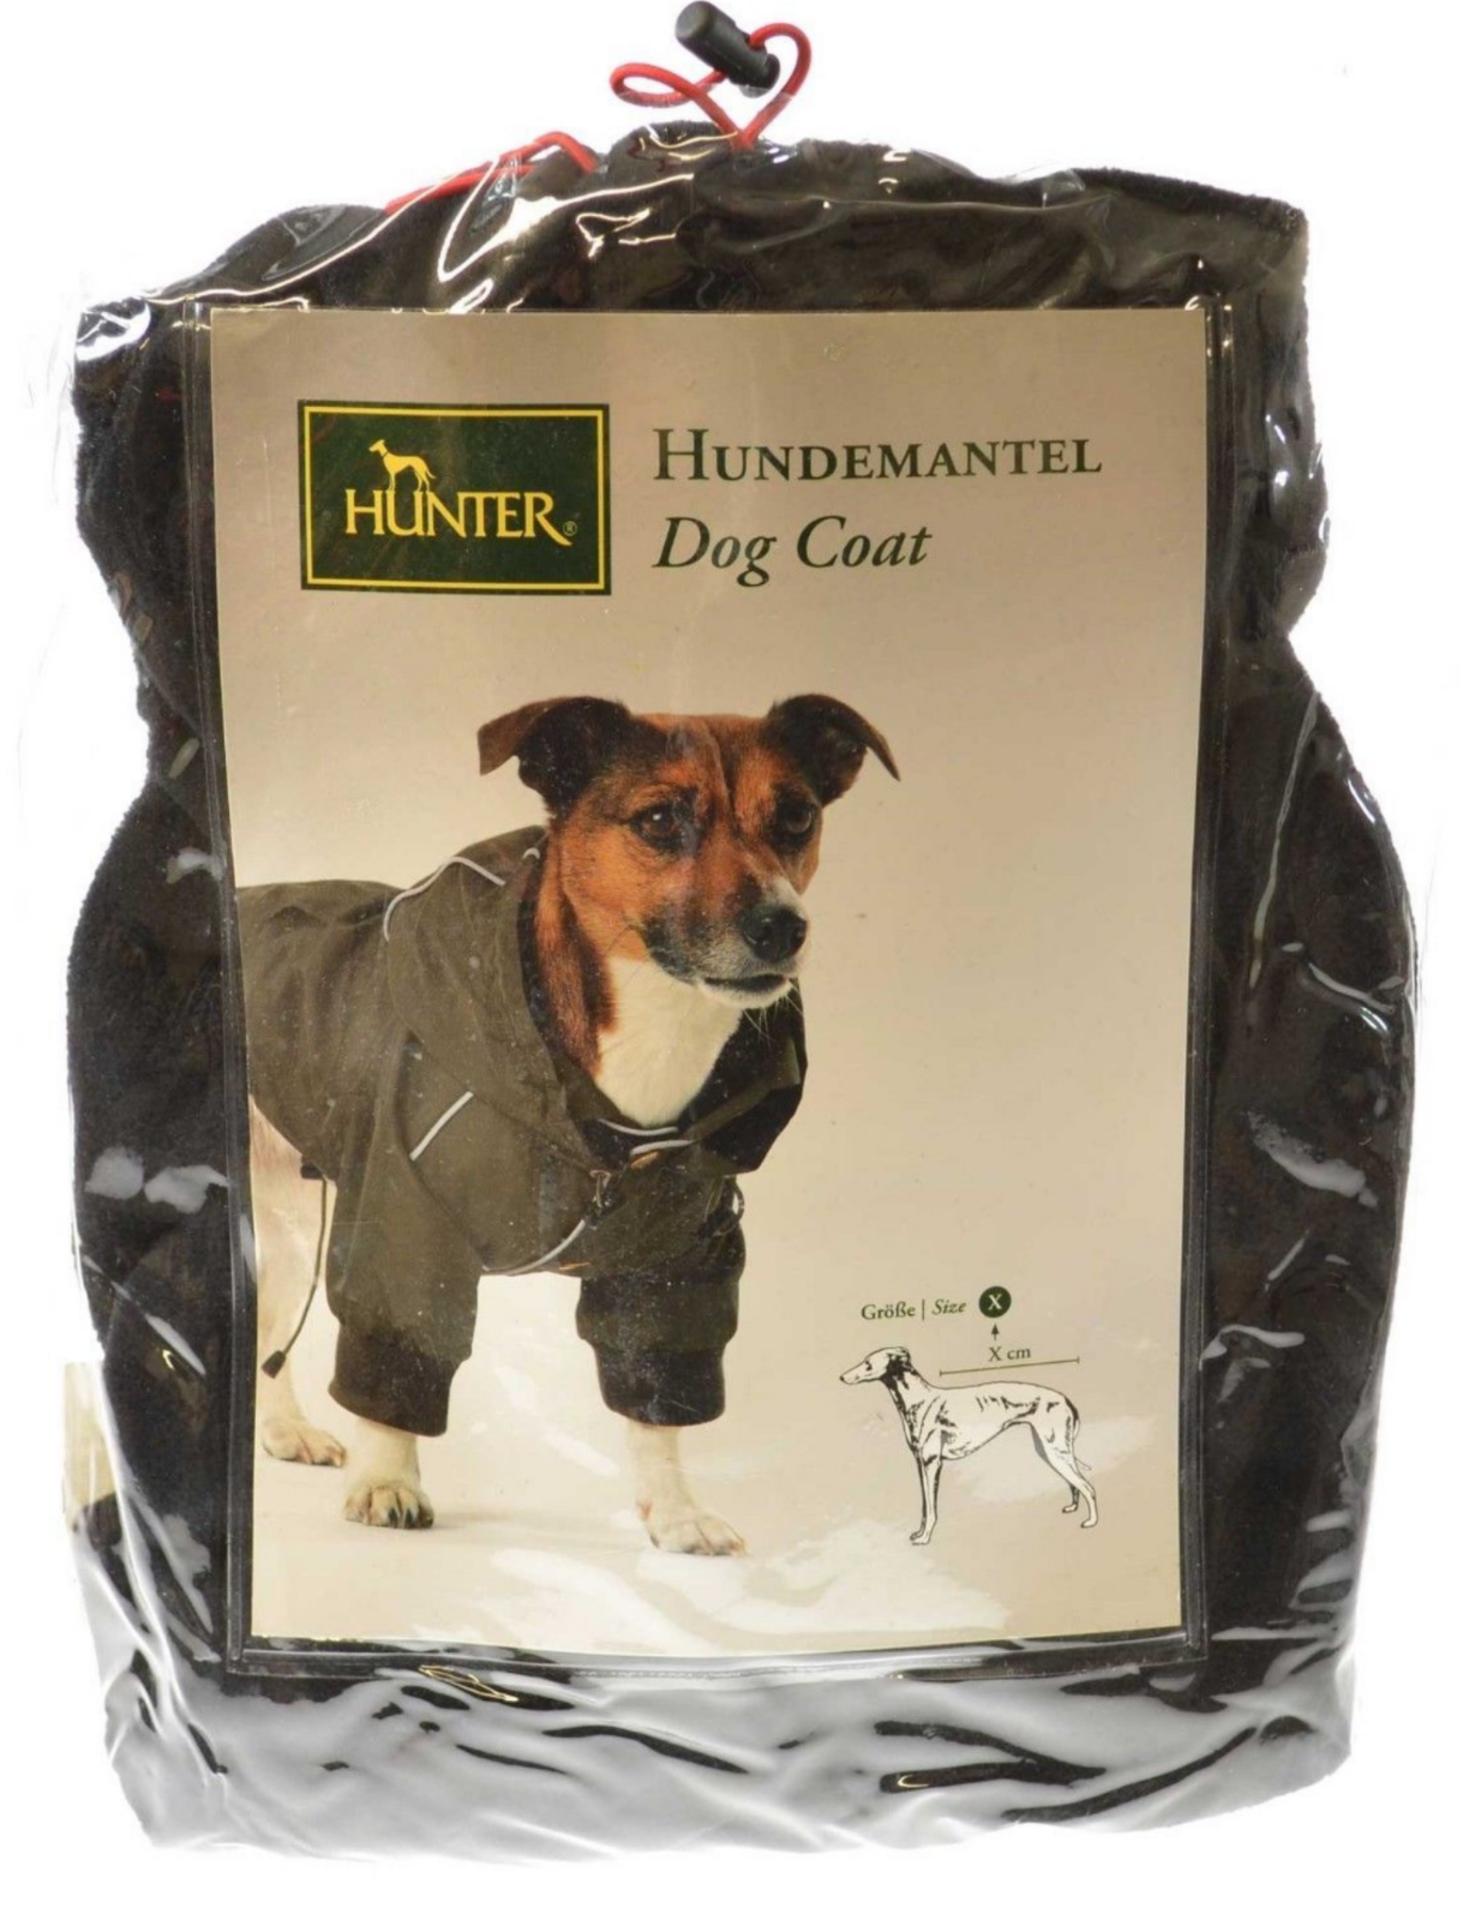 6 x Brand New Hunter Dog Coats Assorted Sizes - Image 2 of 2